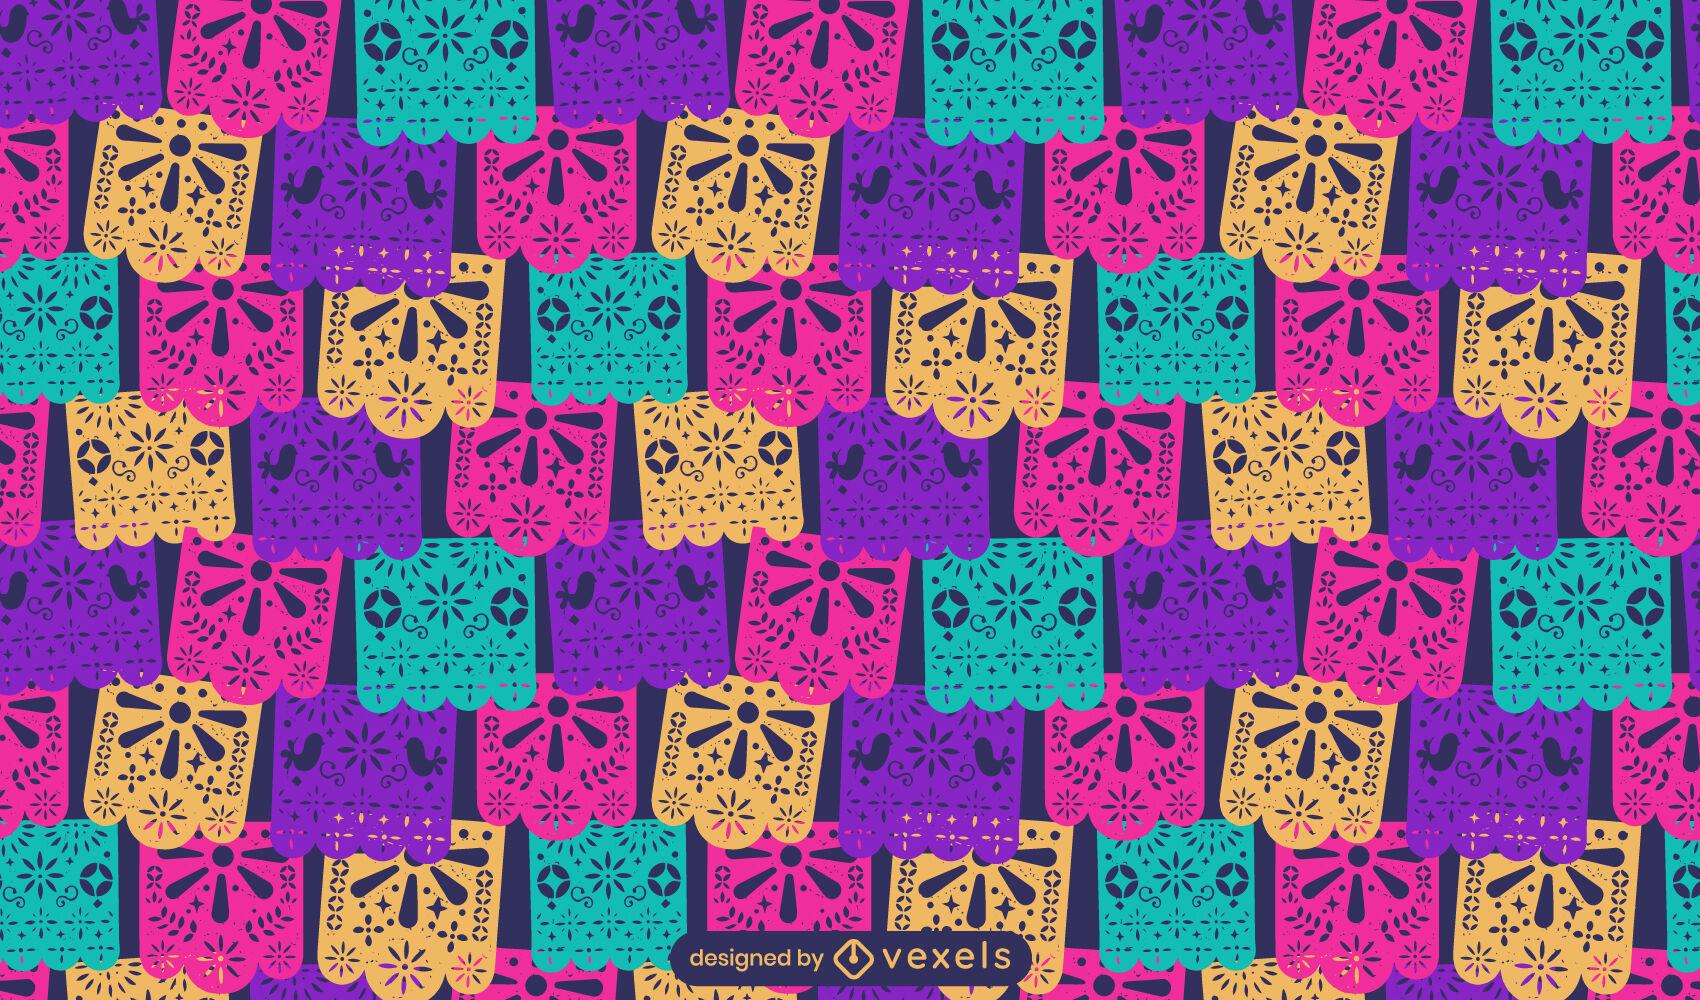 Beautiful pattern papel picado style